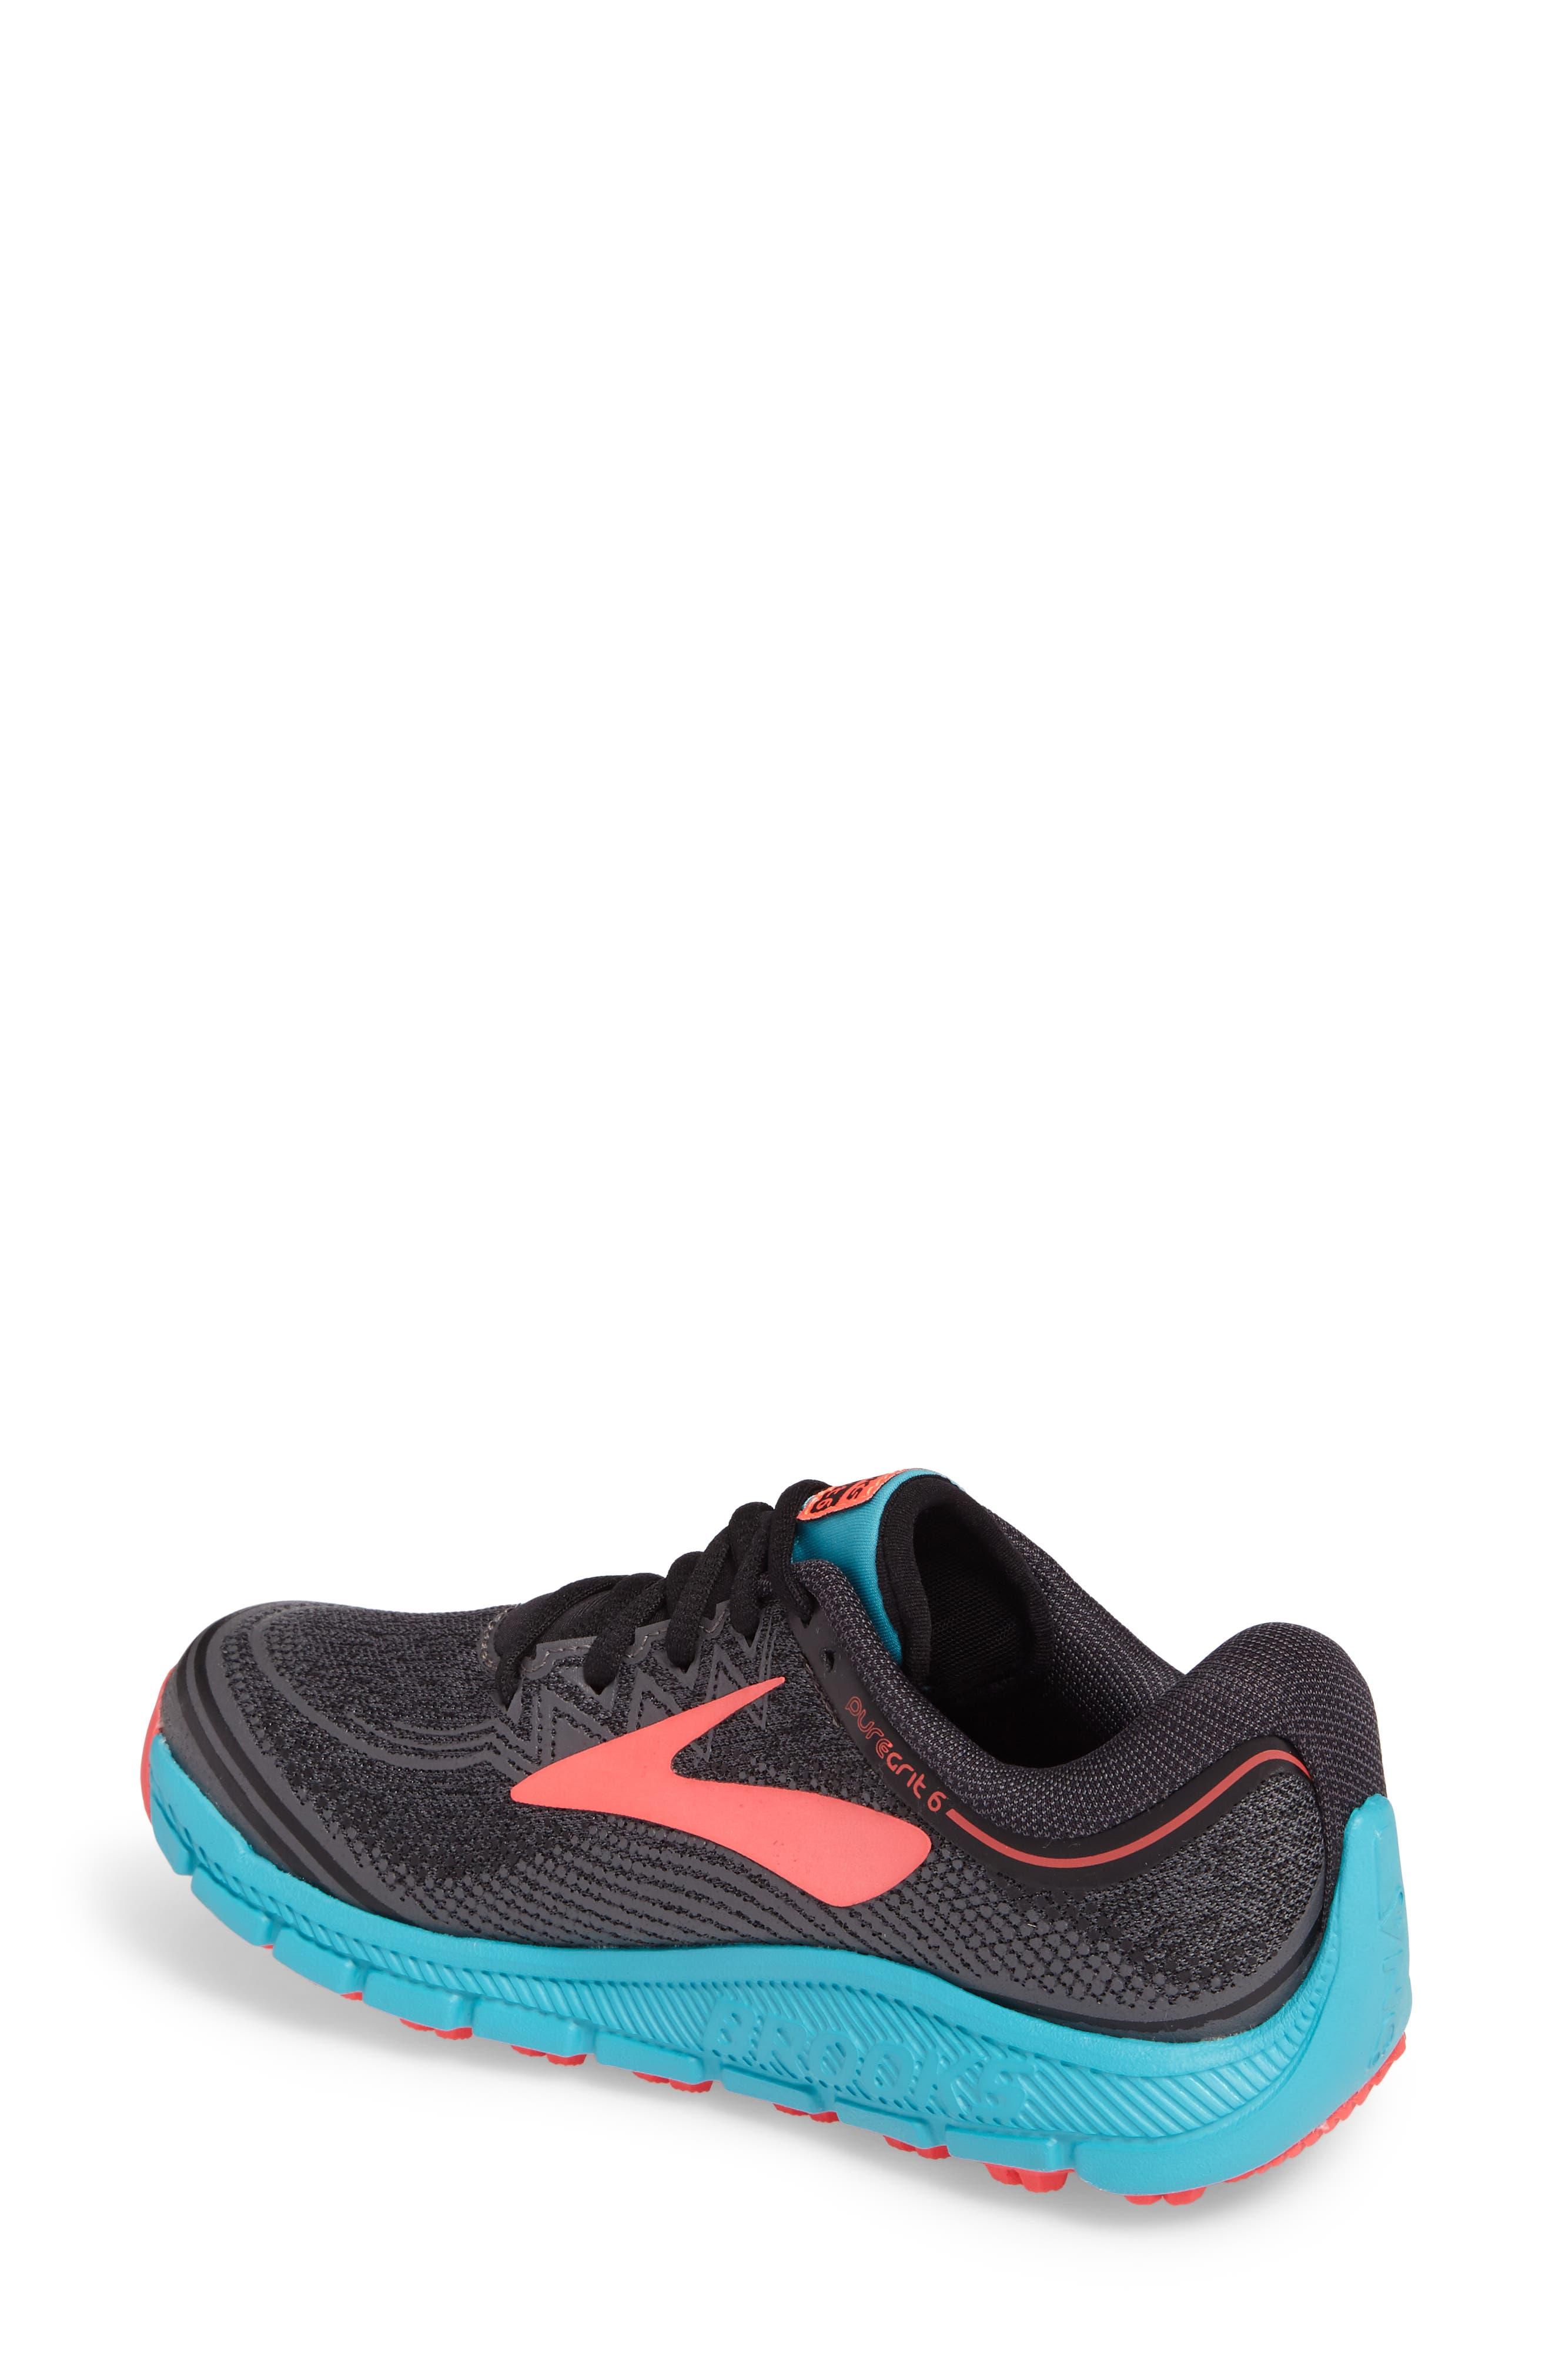 PureGrit 6 Trail Running Shoe,                             Alternate thumbnail 2, color,                             014